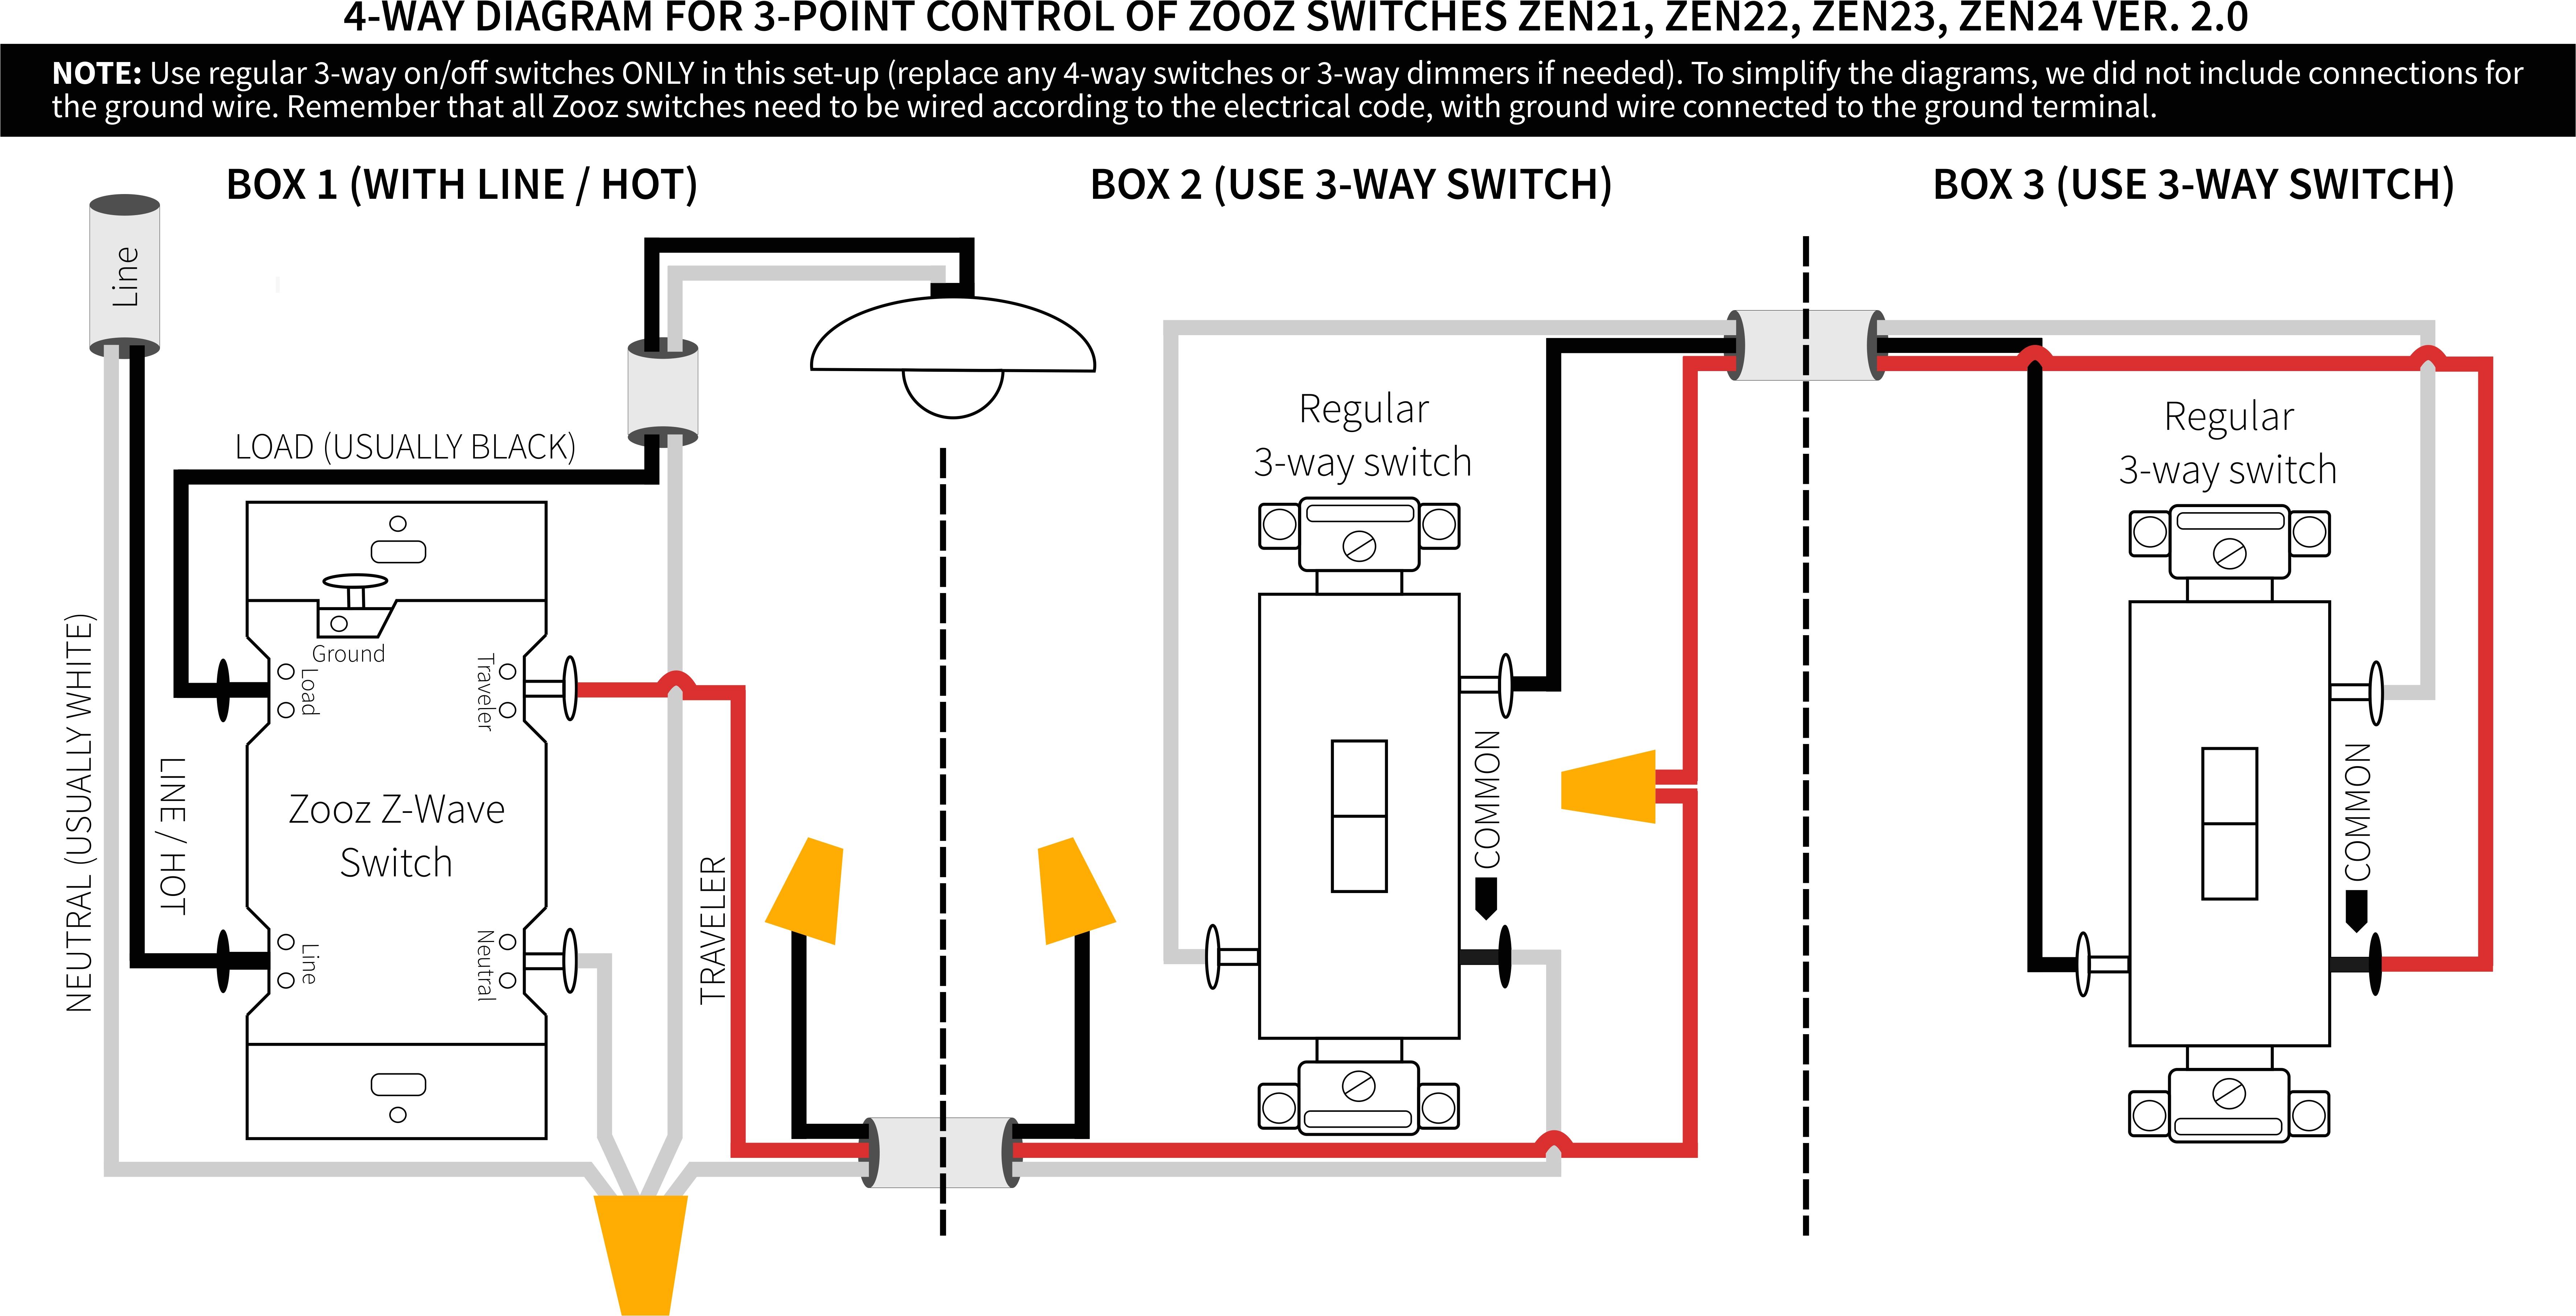 2 Way Dimmer Switch Wiring Diagram Lutron 4 Way Wiring Diagram Wiring Diagram Database